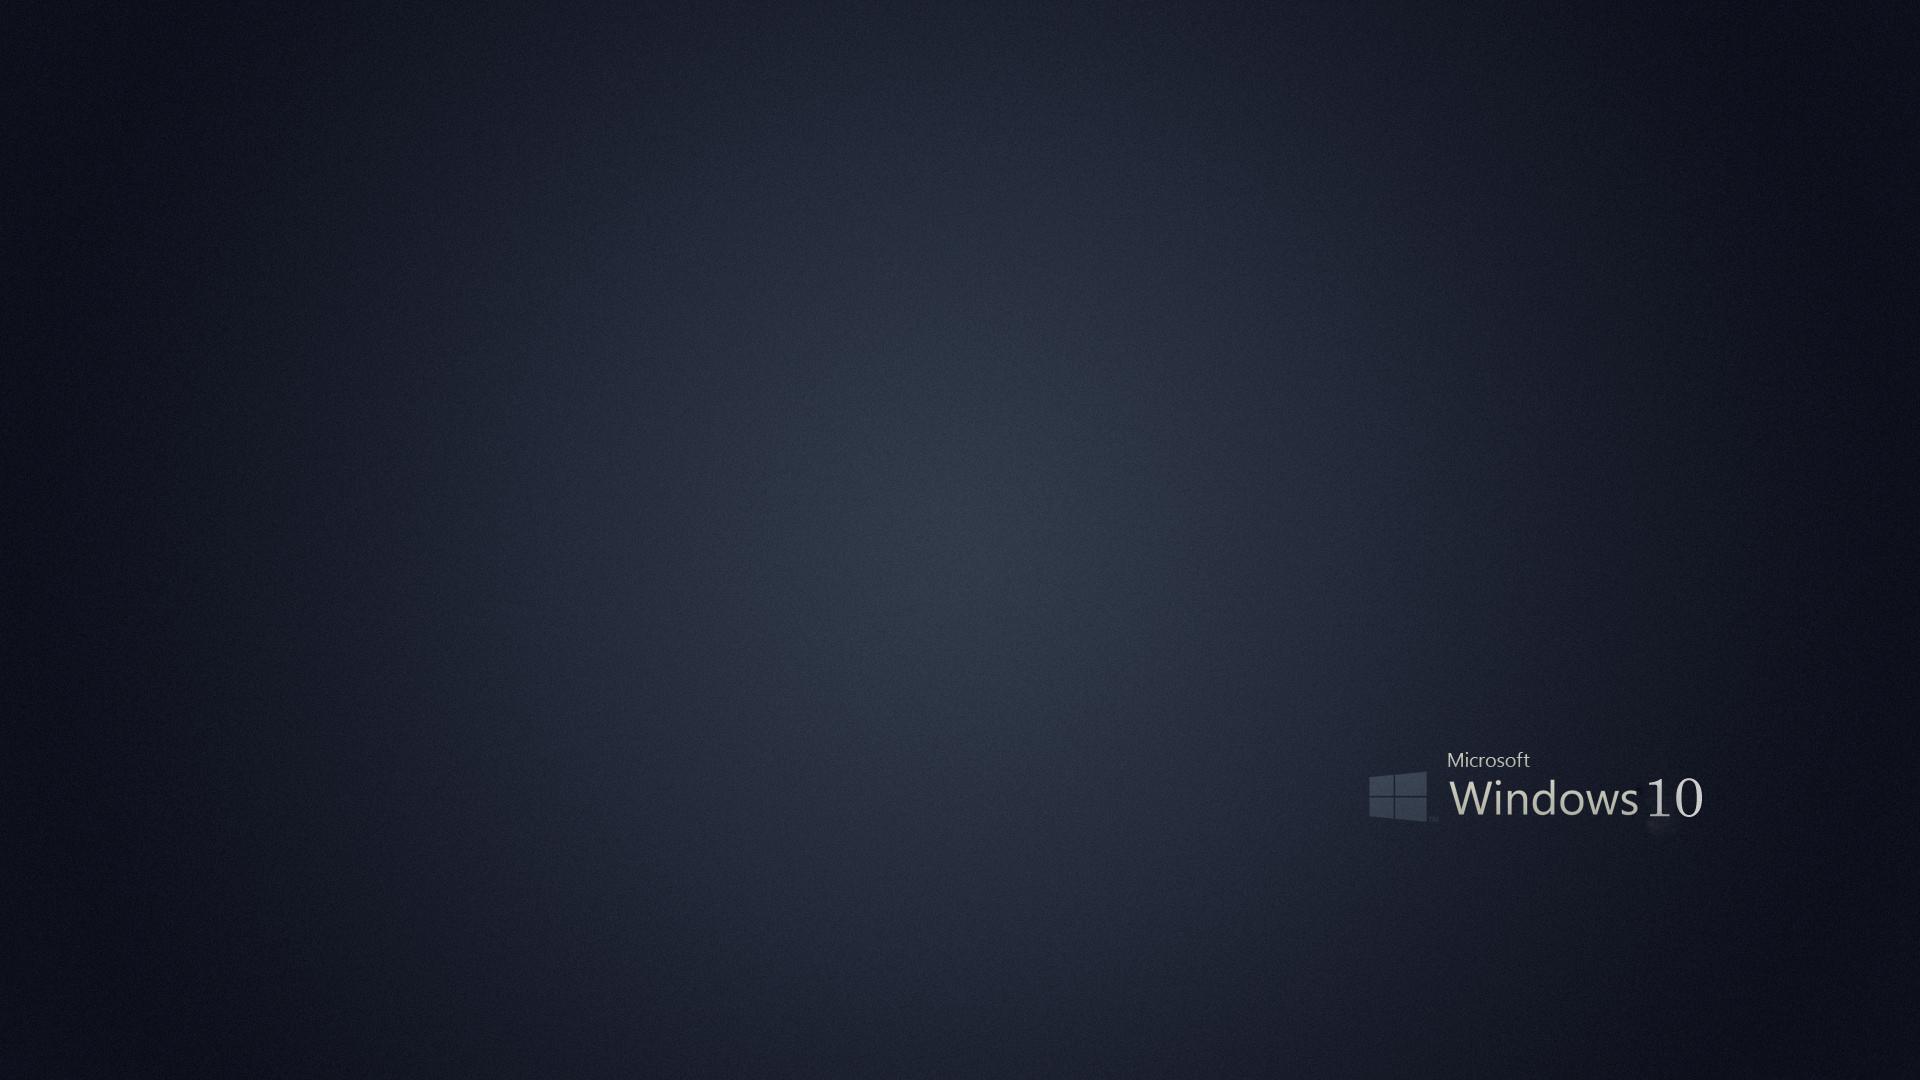 Windows 10 HD Wallpapers